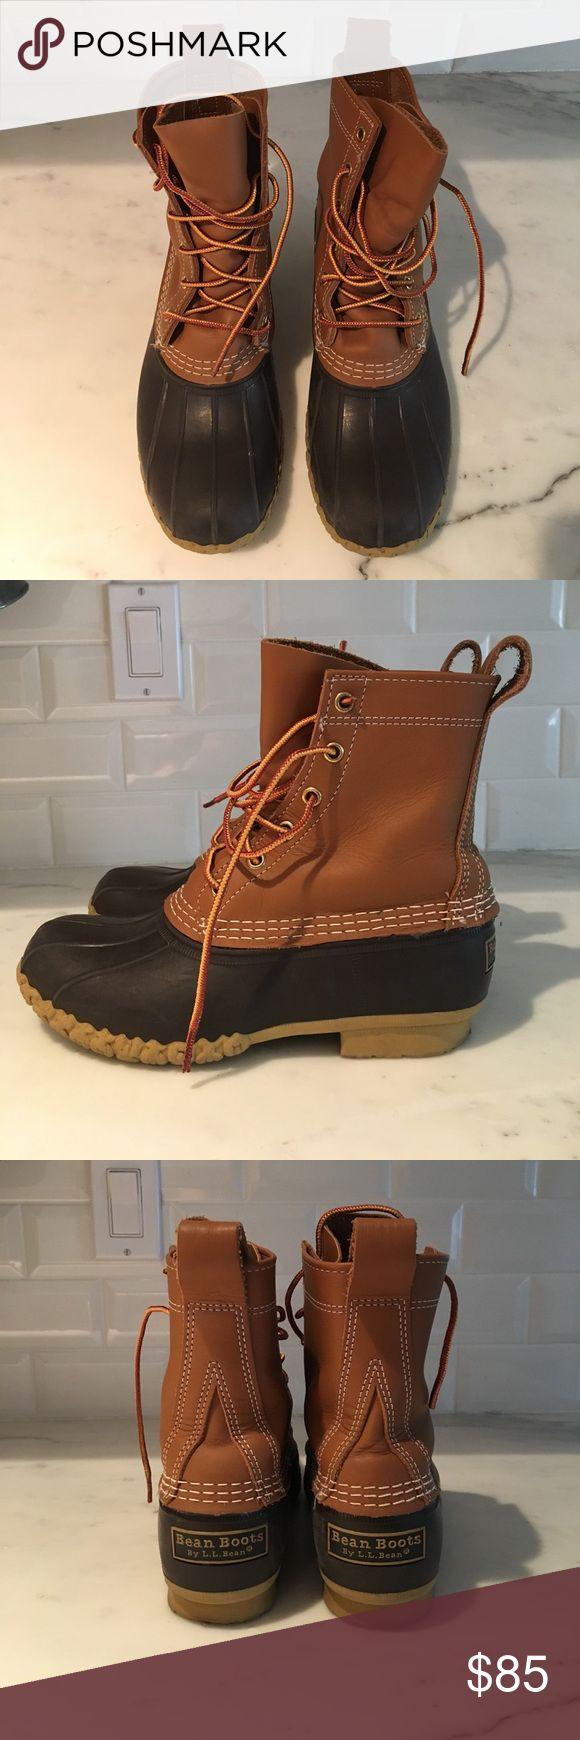 "Size 8 LL Bean boots 8"" Brand new LL bean boots! L.L. Bean Shoes Winter & Rain Boots"